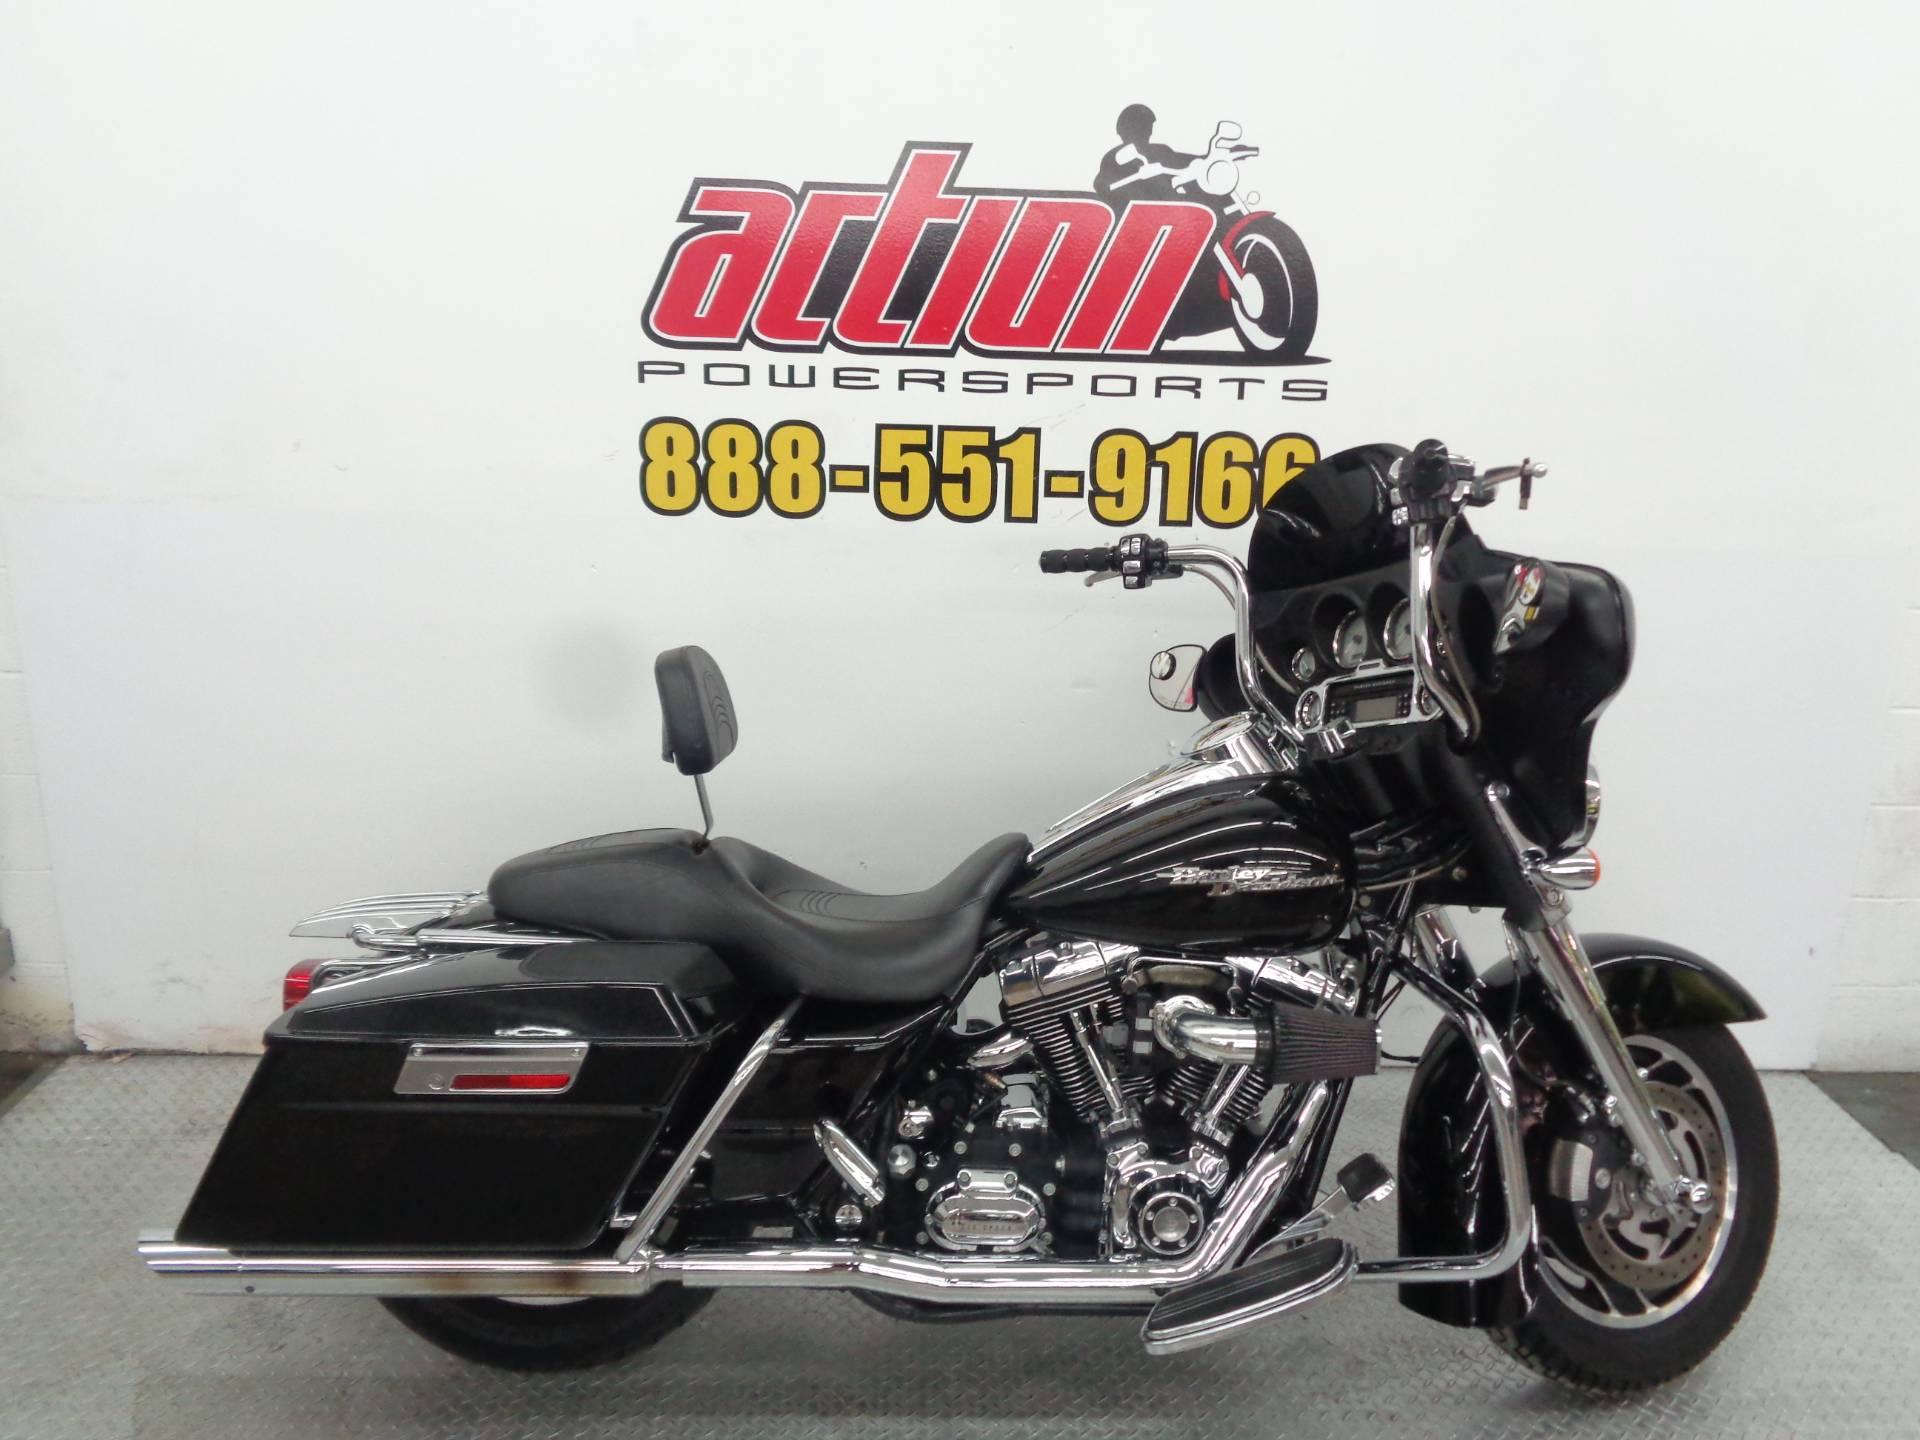 Used 2008 Harley-Davidson Street Glide® Motorcycles in Tulsa